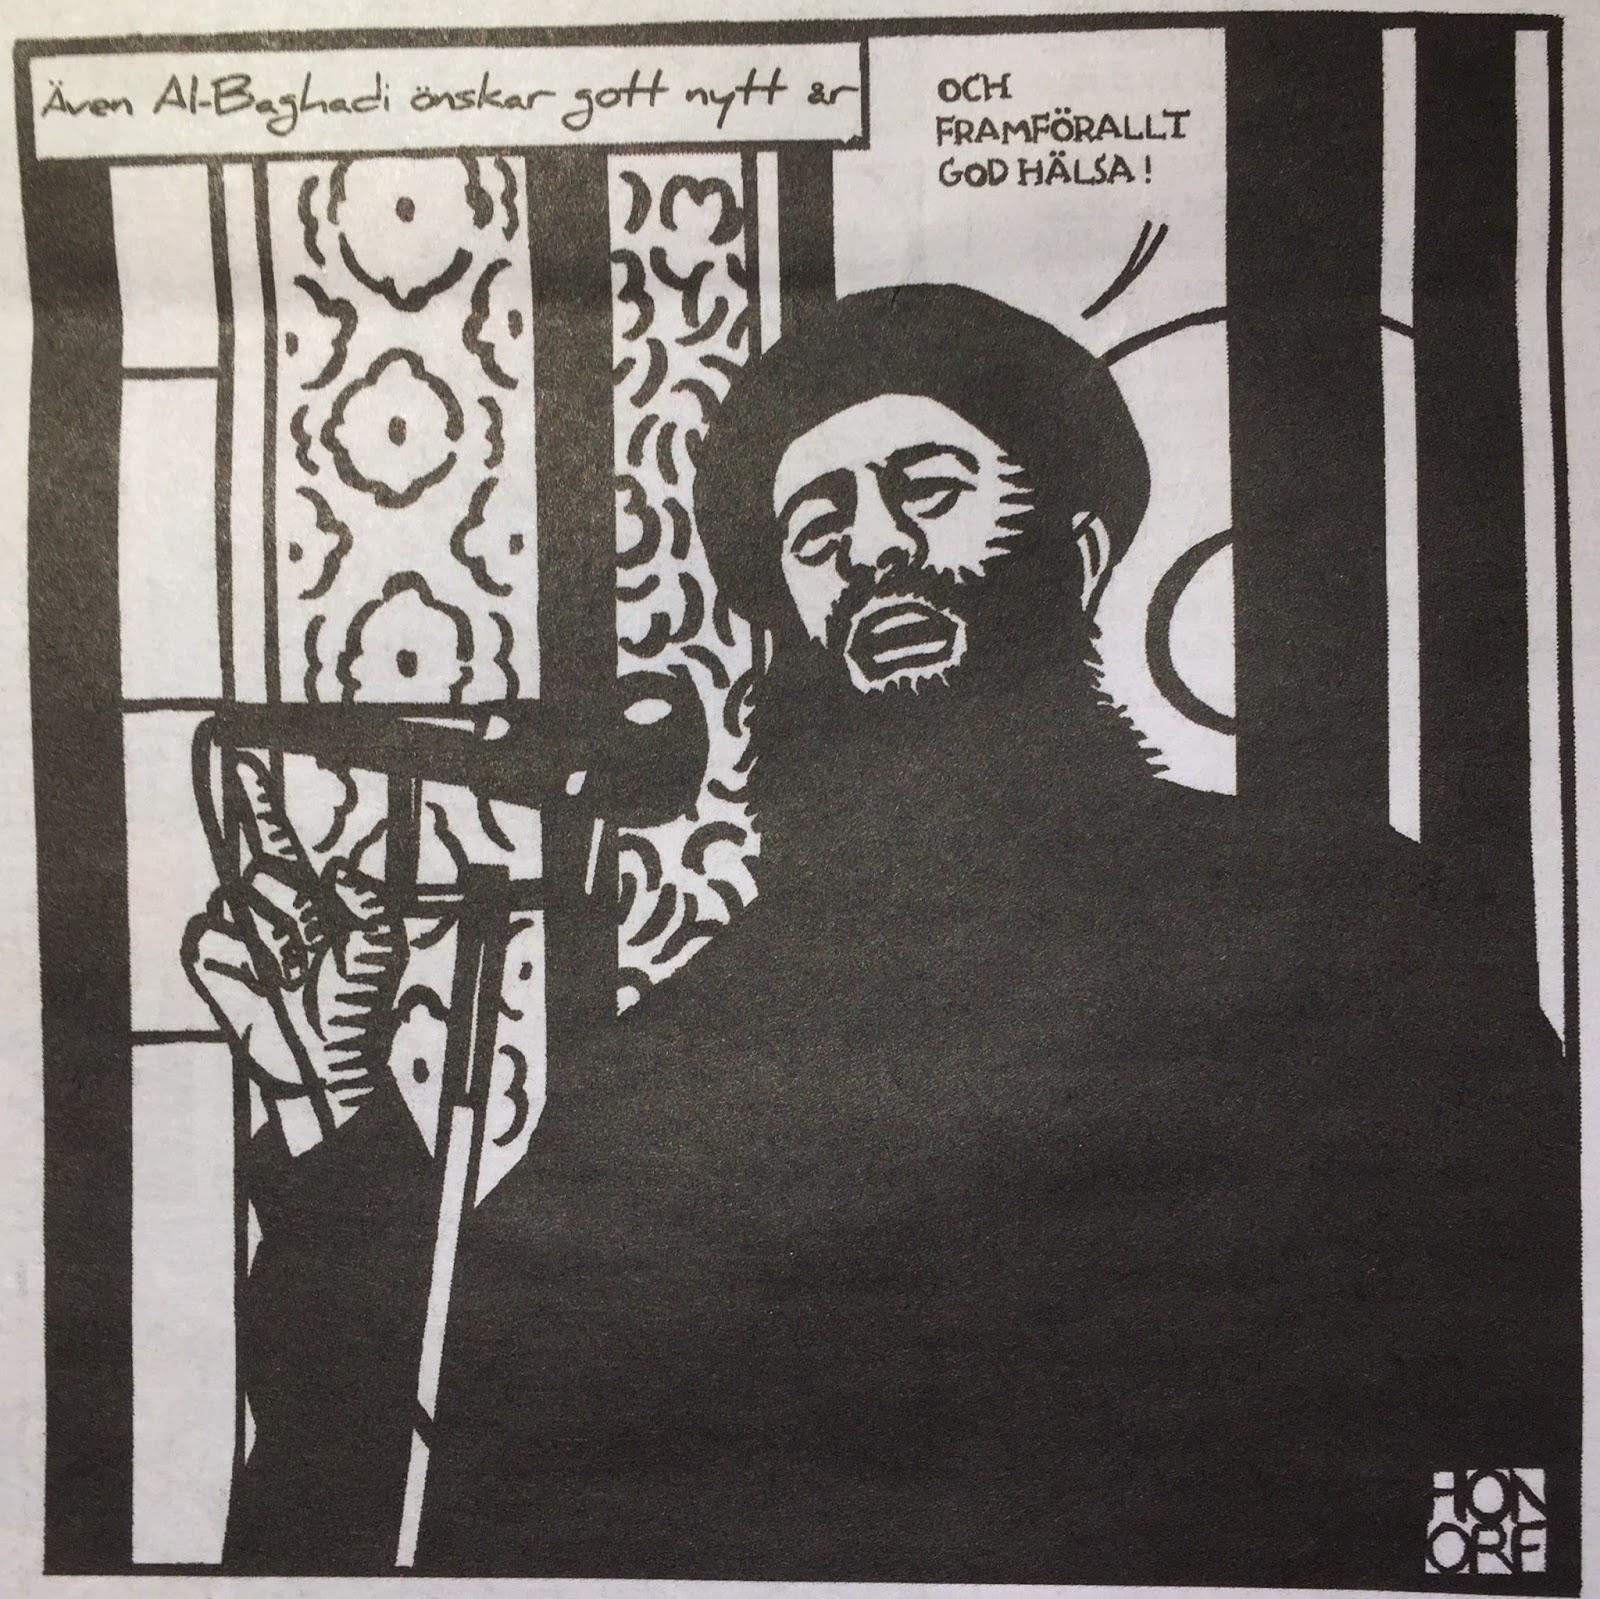 Danmark bakom karikatyrkrisen 2